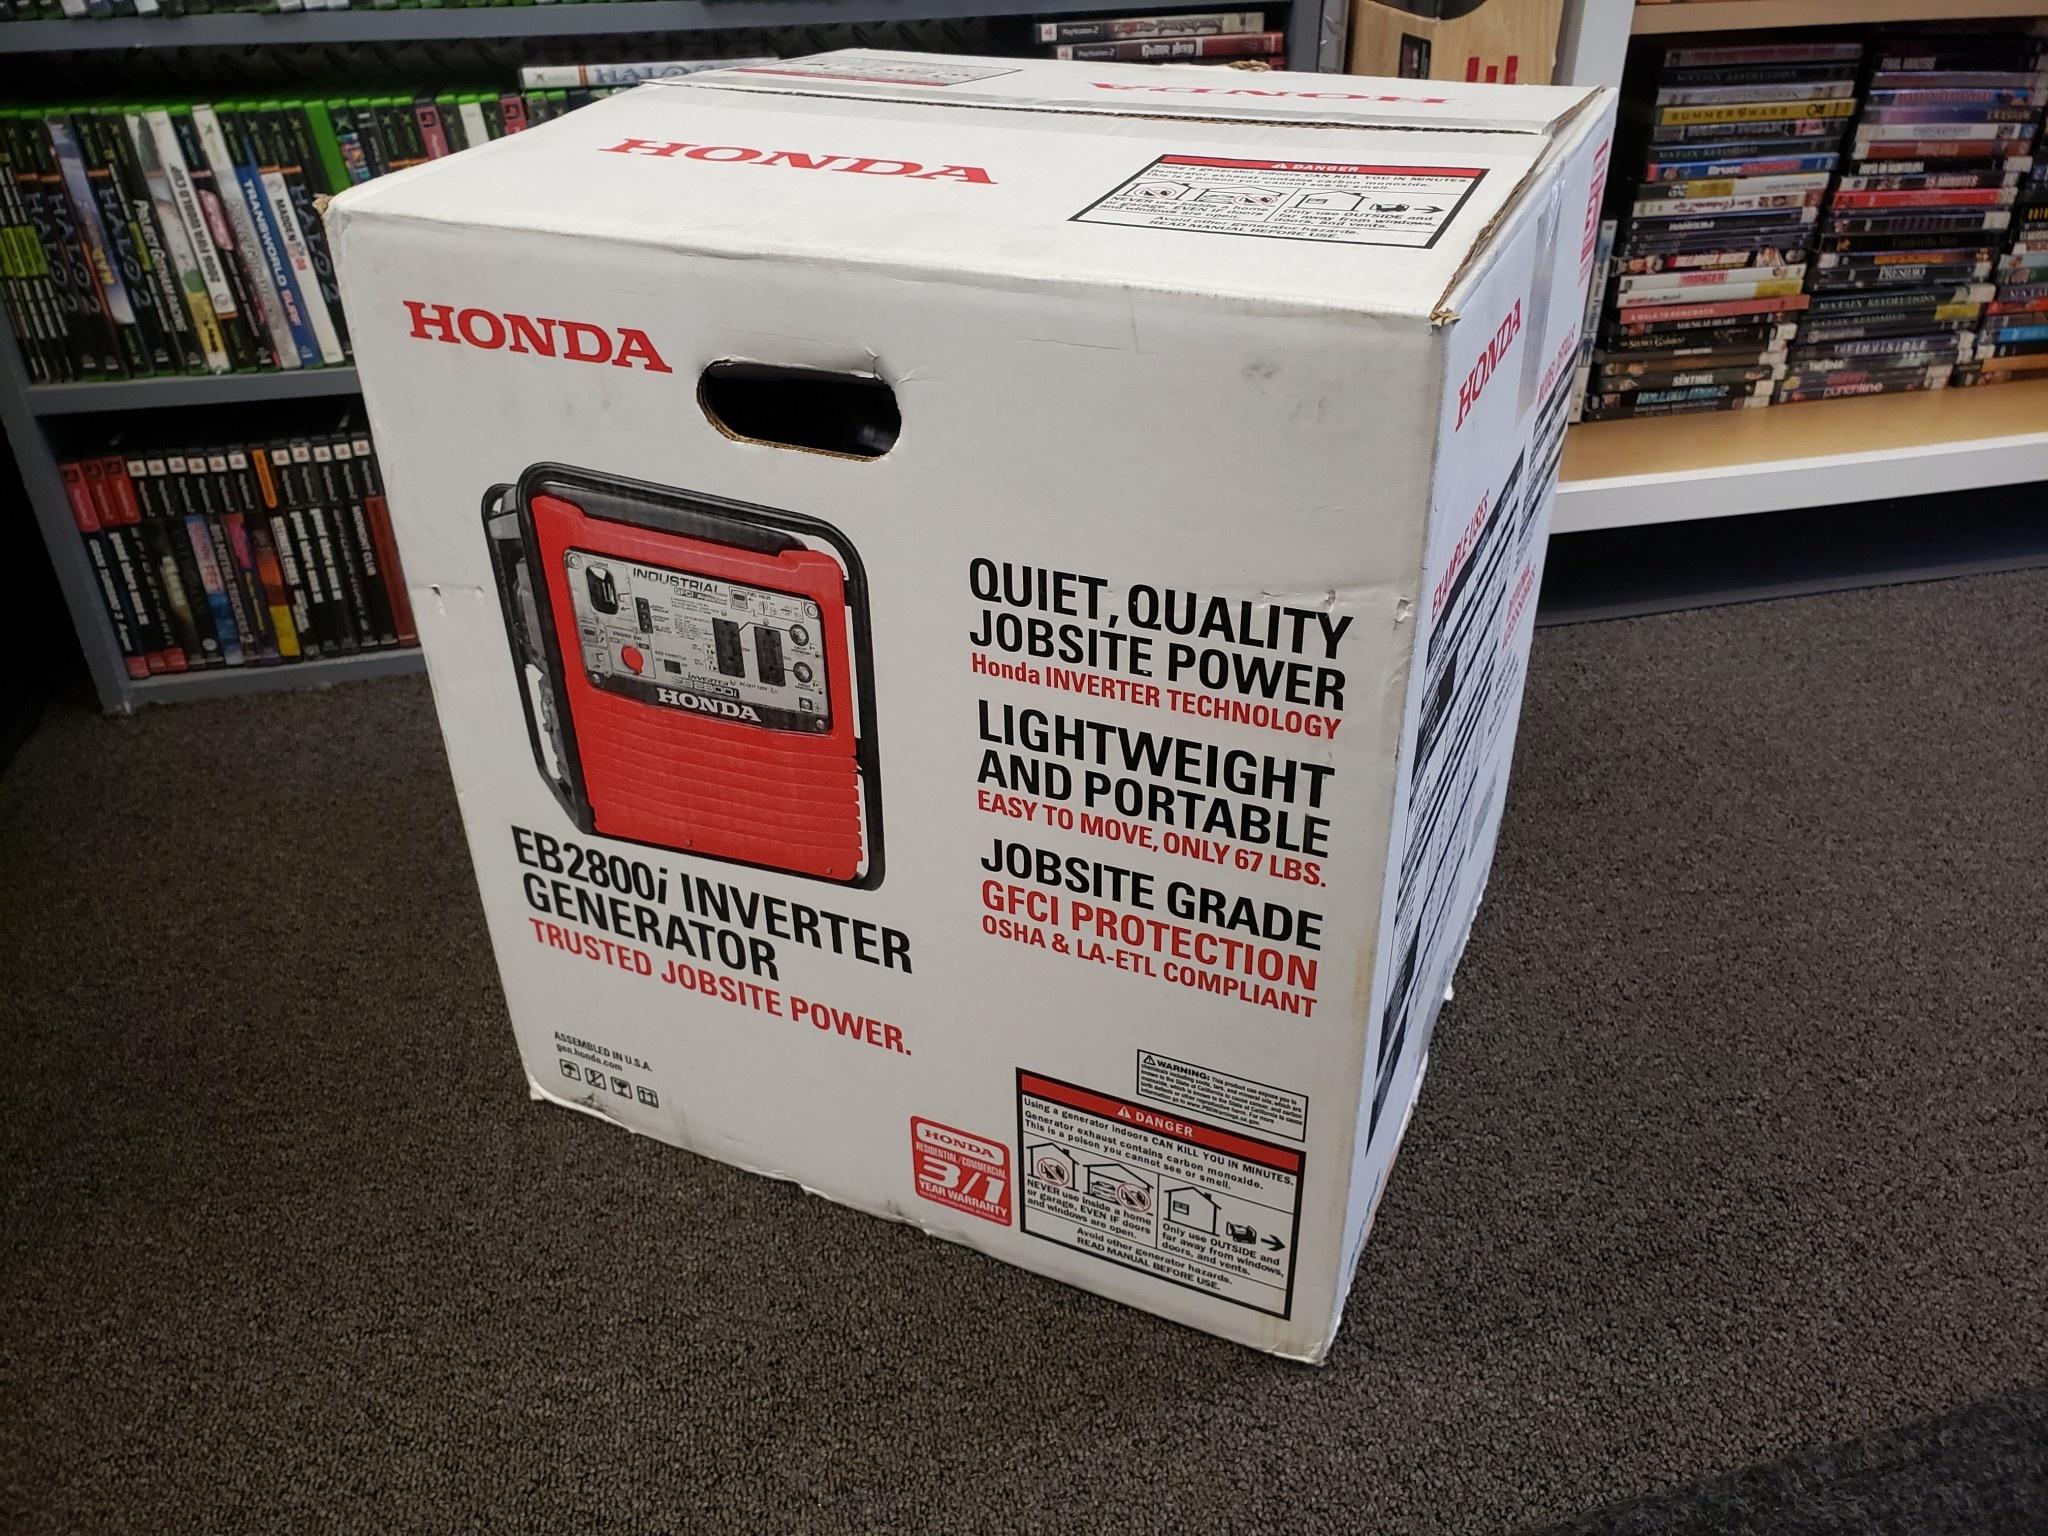 Honda 2,800W EB2800i Gas Portable Inverter Generator - New